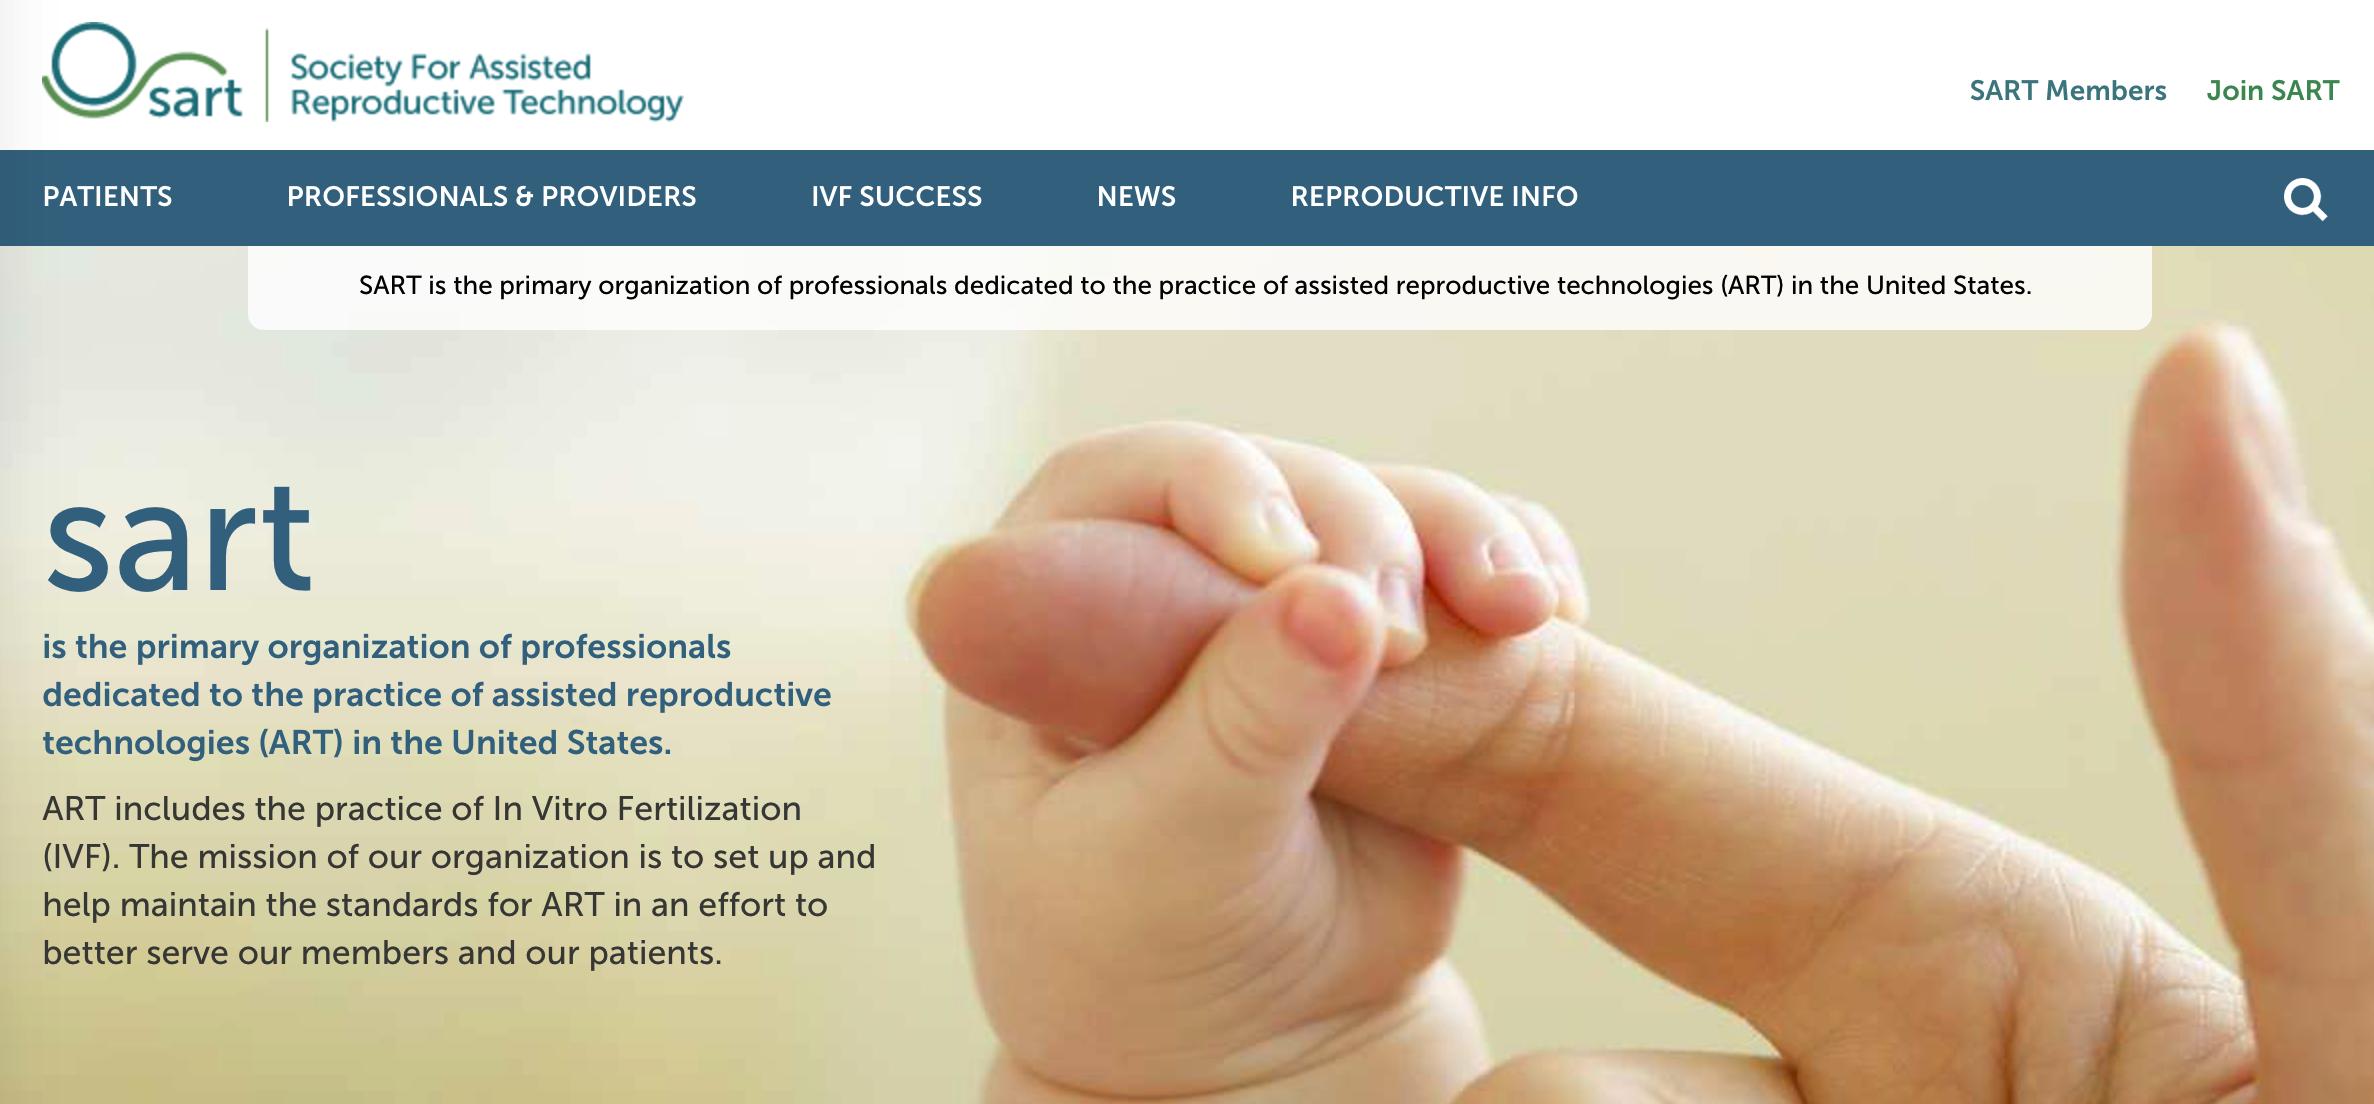 SART美国辅助生殖技术协会.png